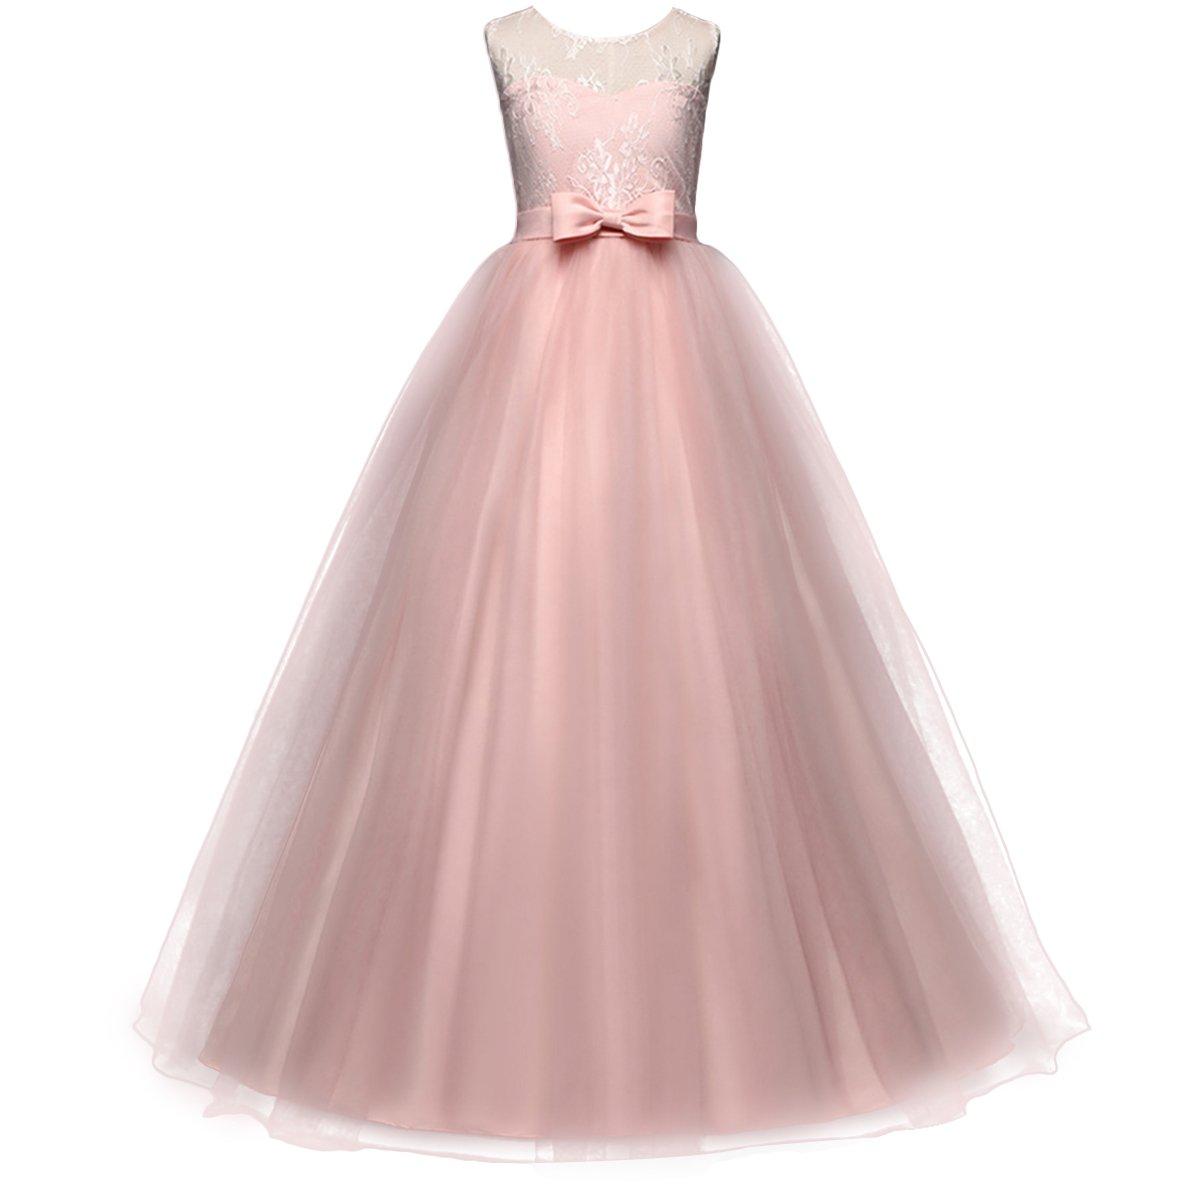 92c65ddfd291d Little Big Girl Flower Deep-V Back Lace Pageant Long Dress Wedding Party  Formal Evening Dance Gowns